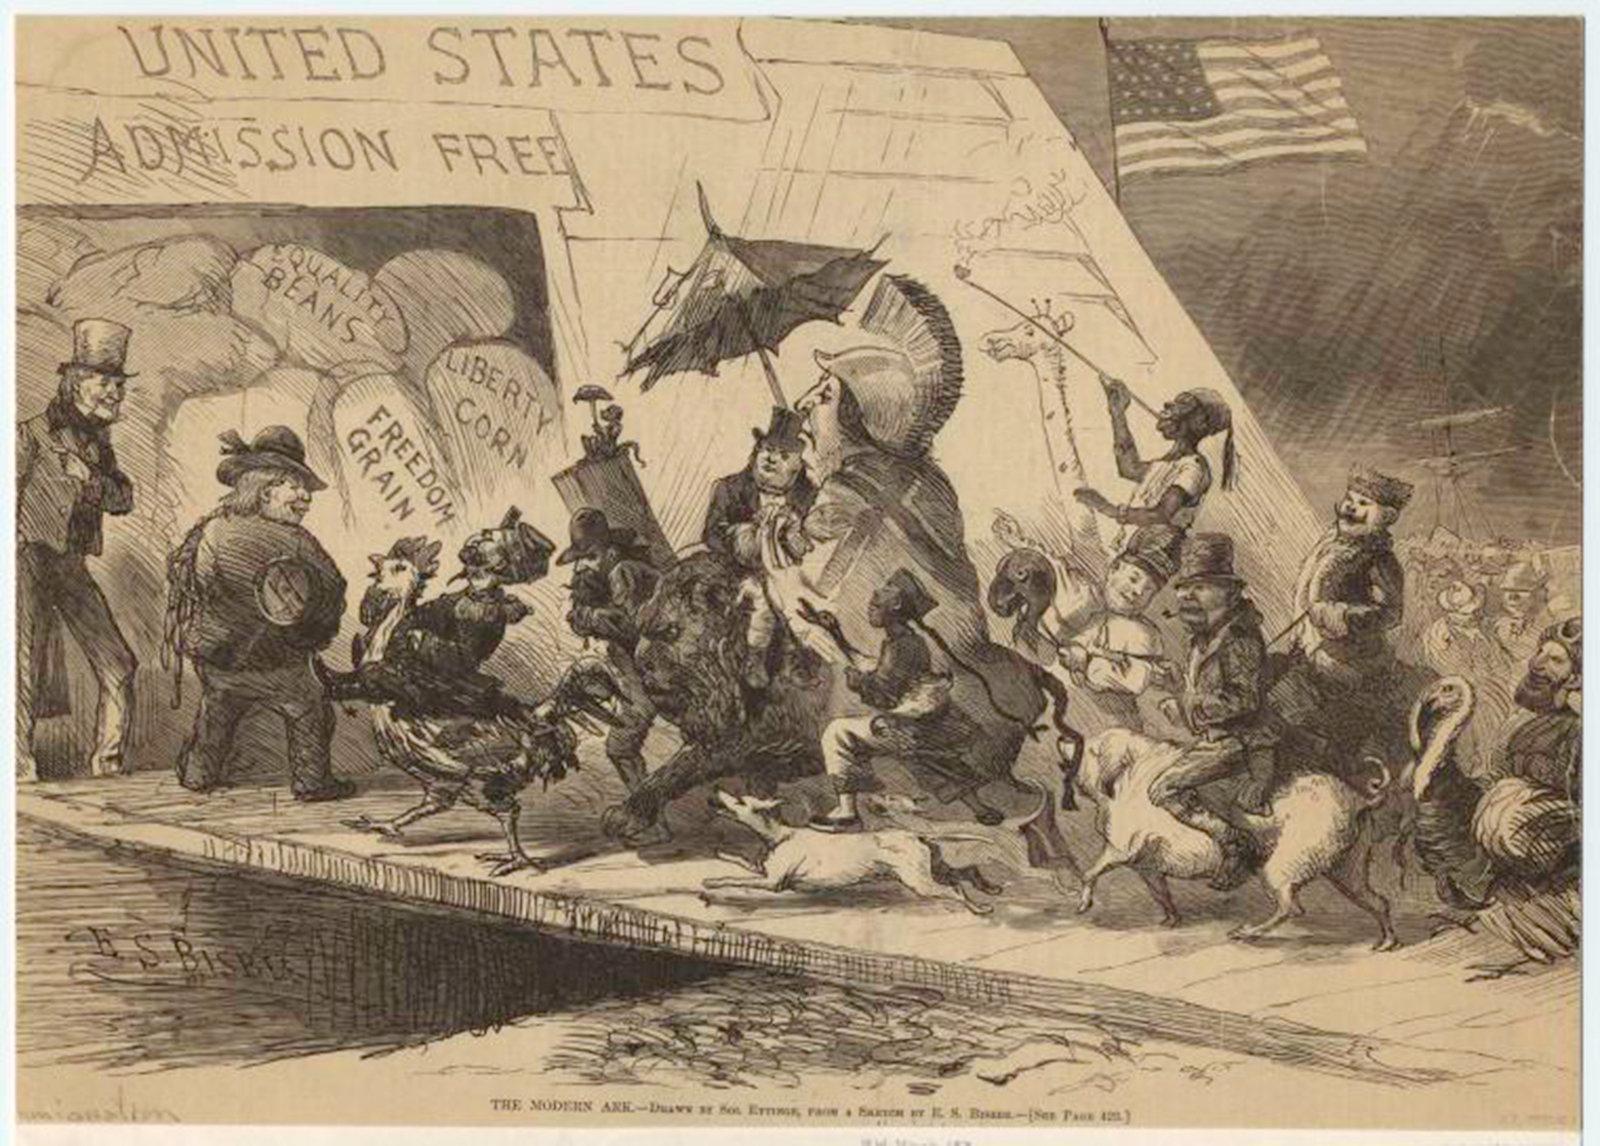 The modern ark, Bisbee, Ezra; Eytinge, Solomon 1871, New York, NYPL Digital Gallery Harper's weekly : a journal of civilization, Public Domain Mark